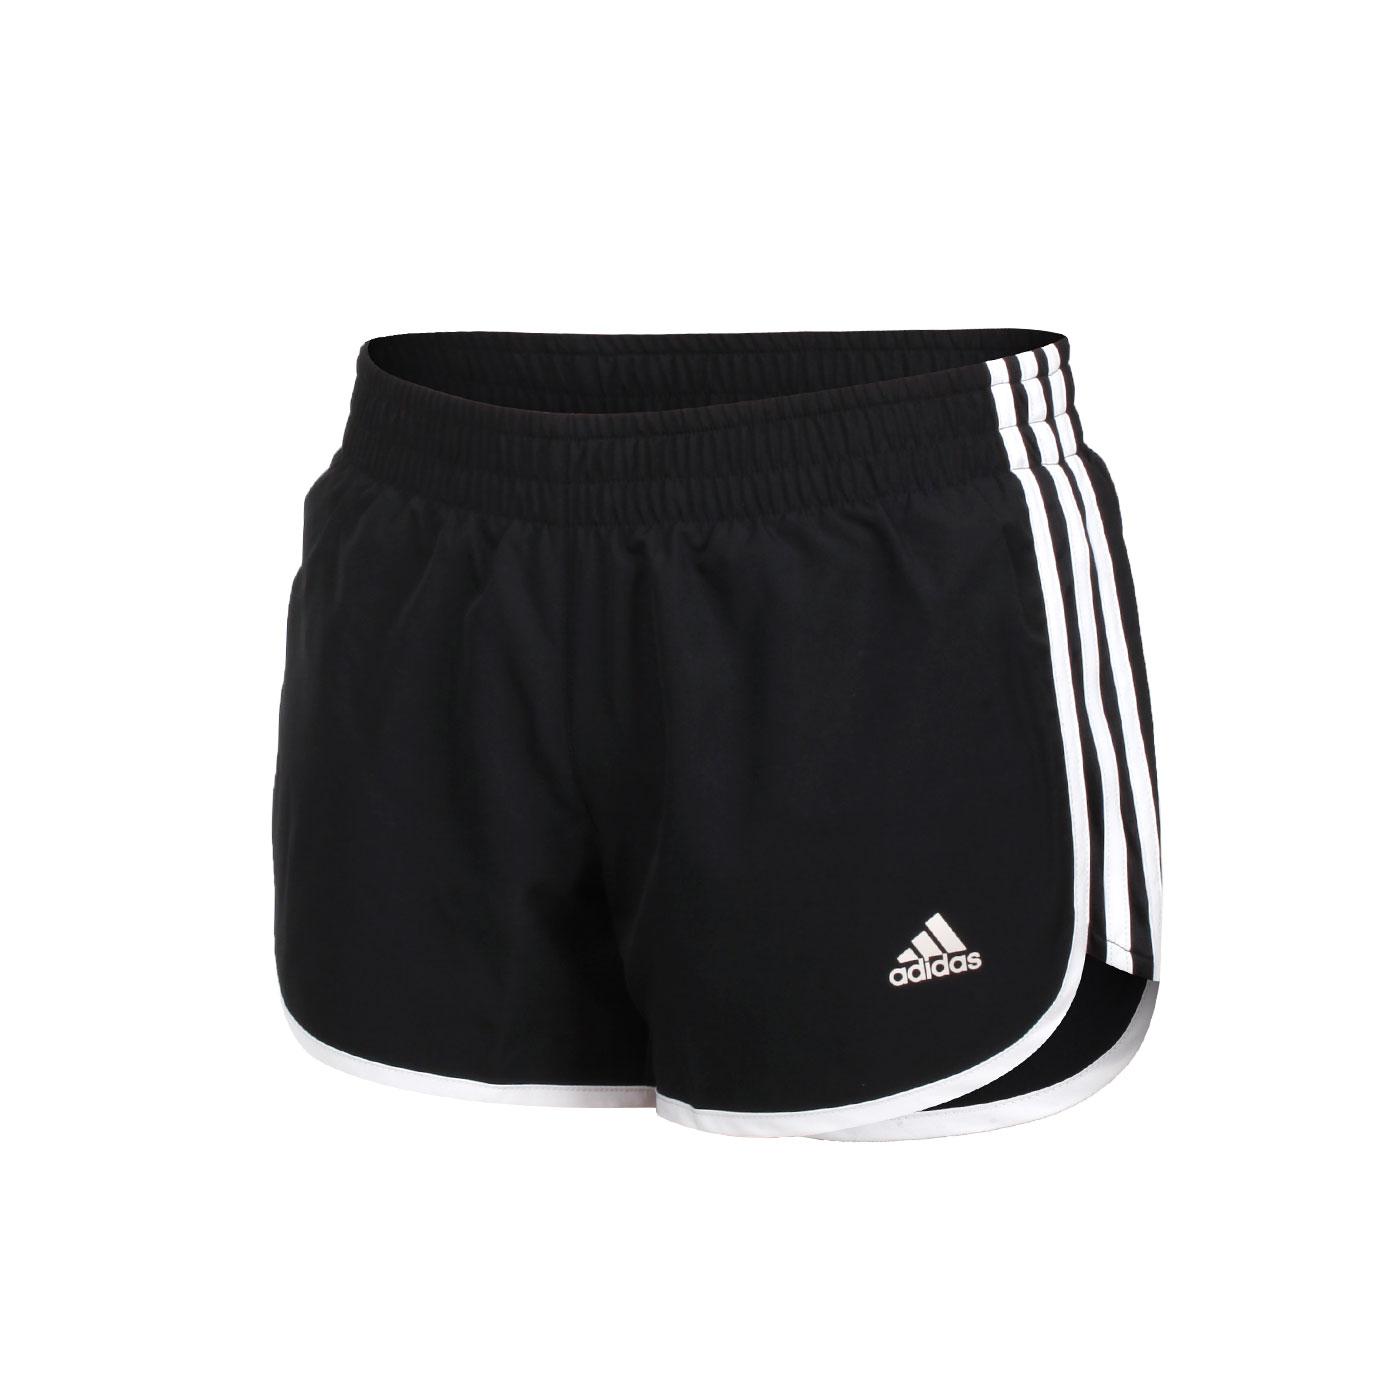 ADIDAS 女款運動短褲 GK5265 - 黑白